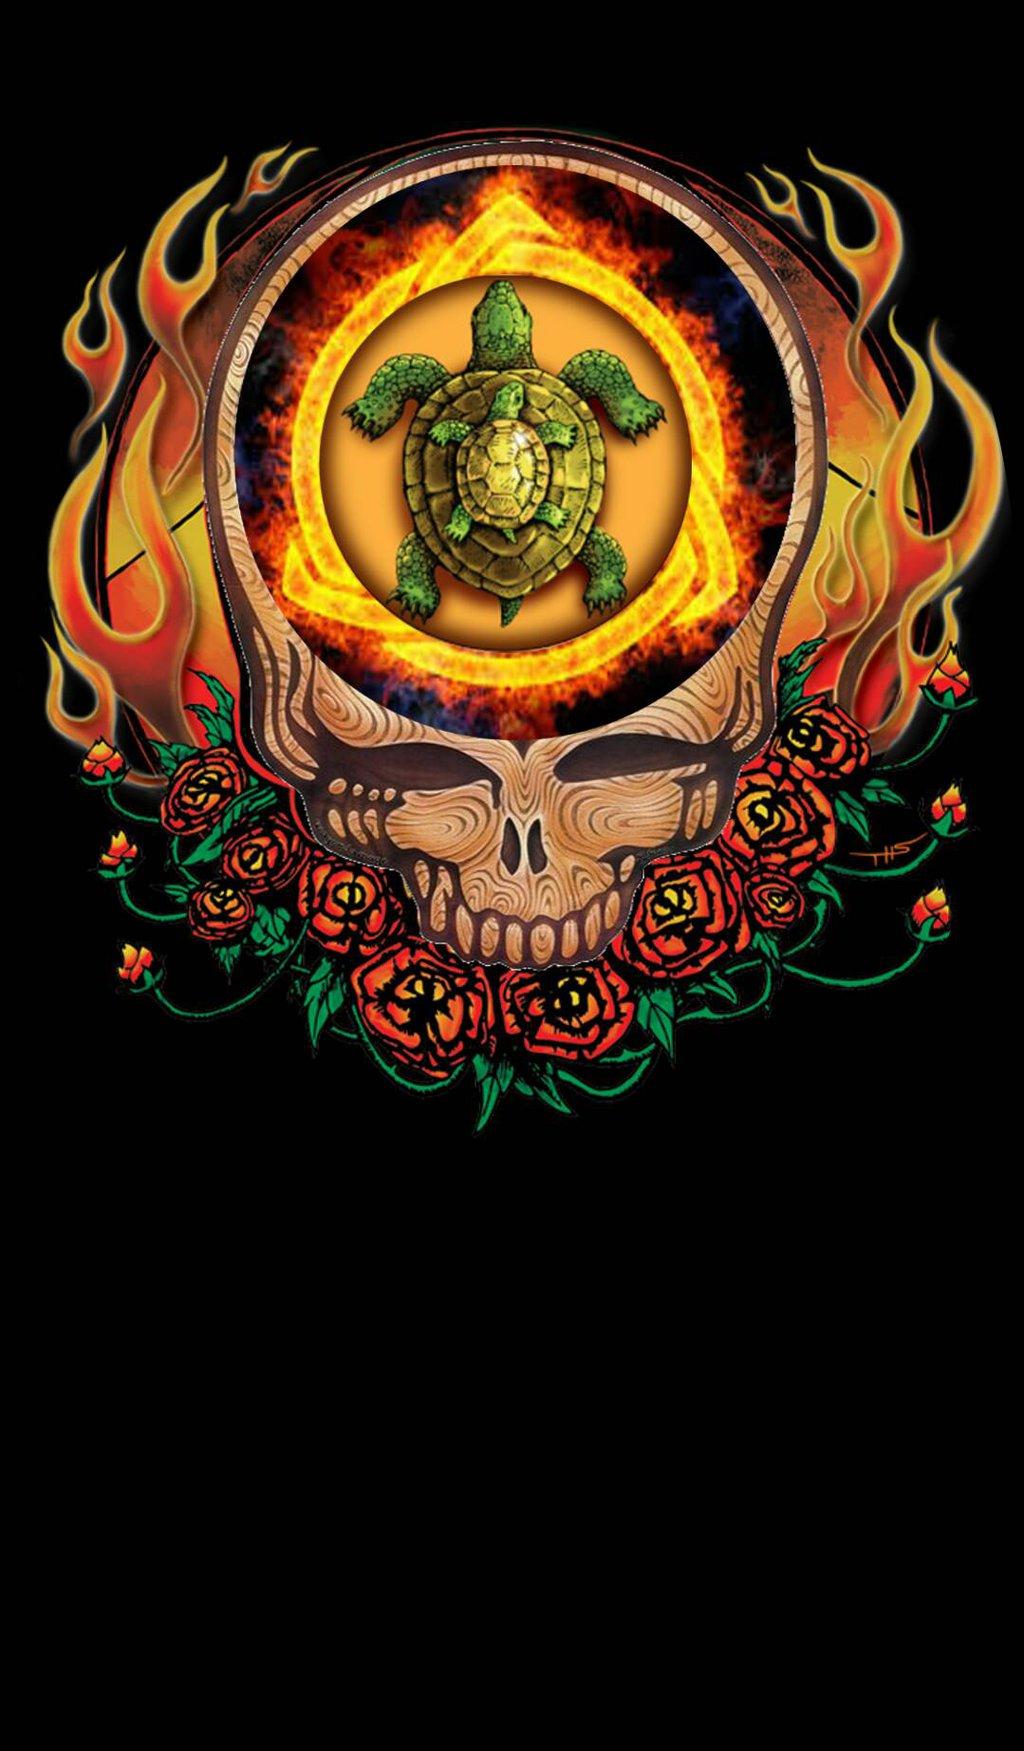 Grateful Dead Wallpaper For Android 1024x1751   Grateful Dead 1024x1751